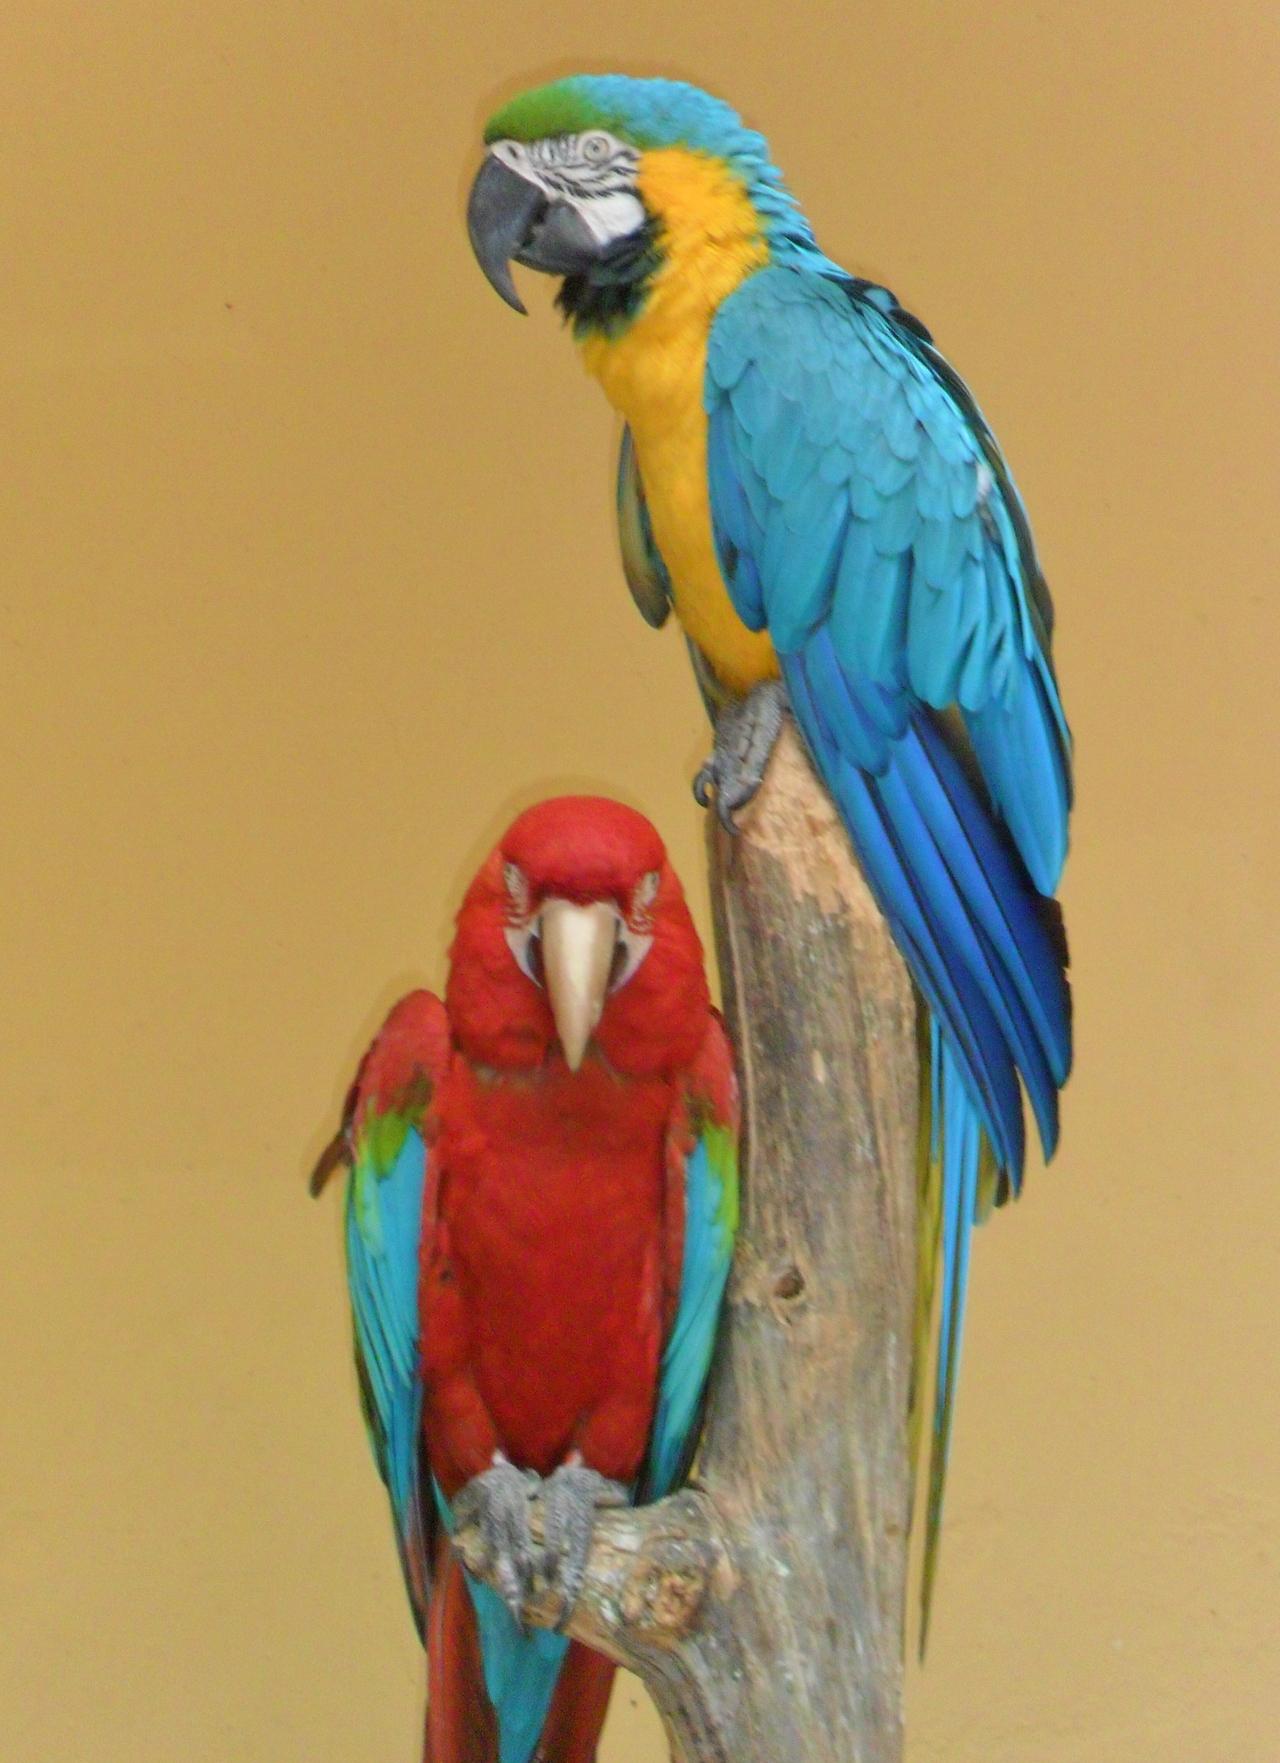 vwcampervan-aldridge :     Colourful parrots, Gran Canaria, Canary Islands   All Original Photography by     http://vwcampervan-aldridge.tumblr.com